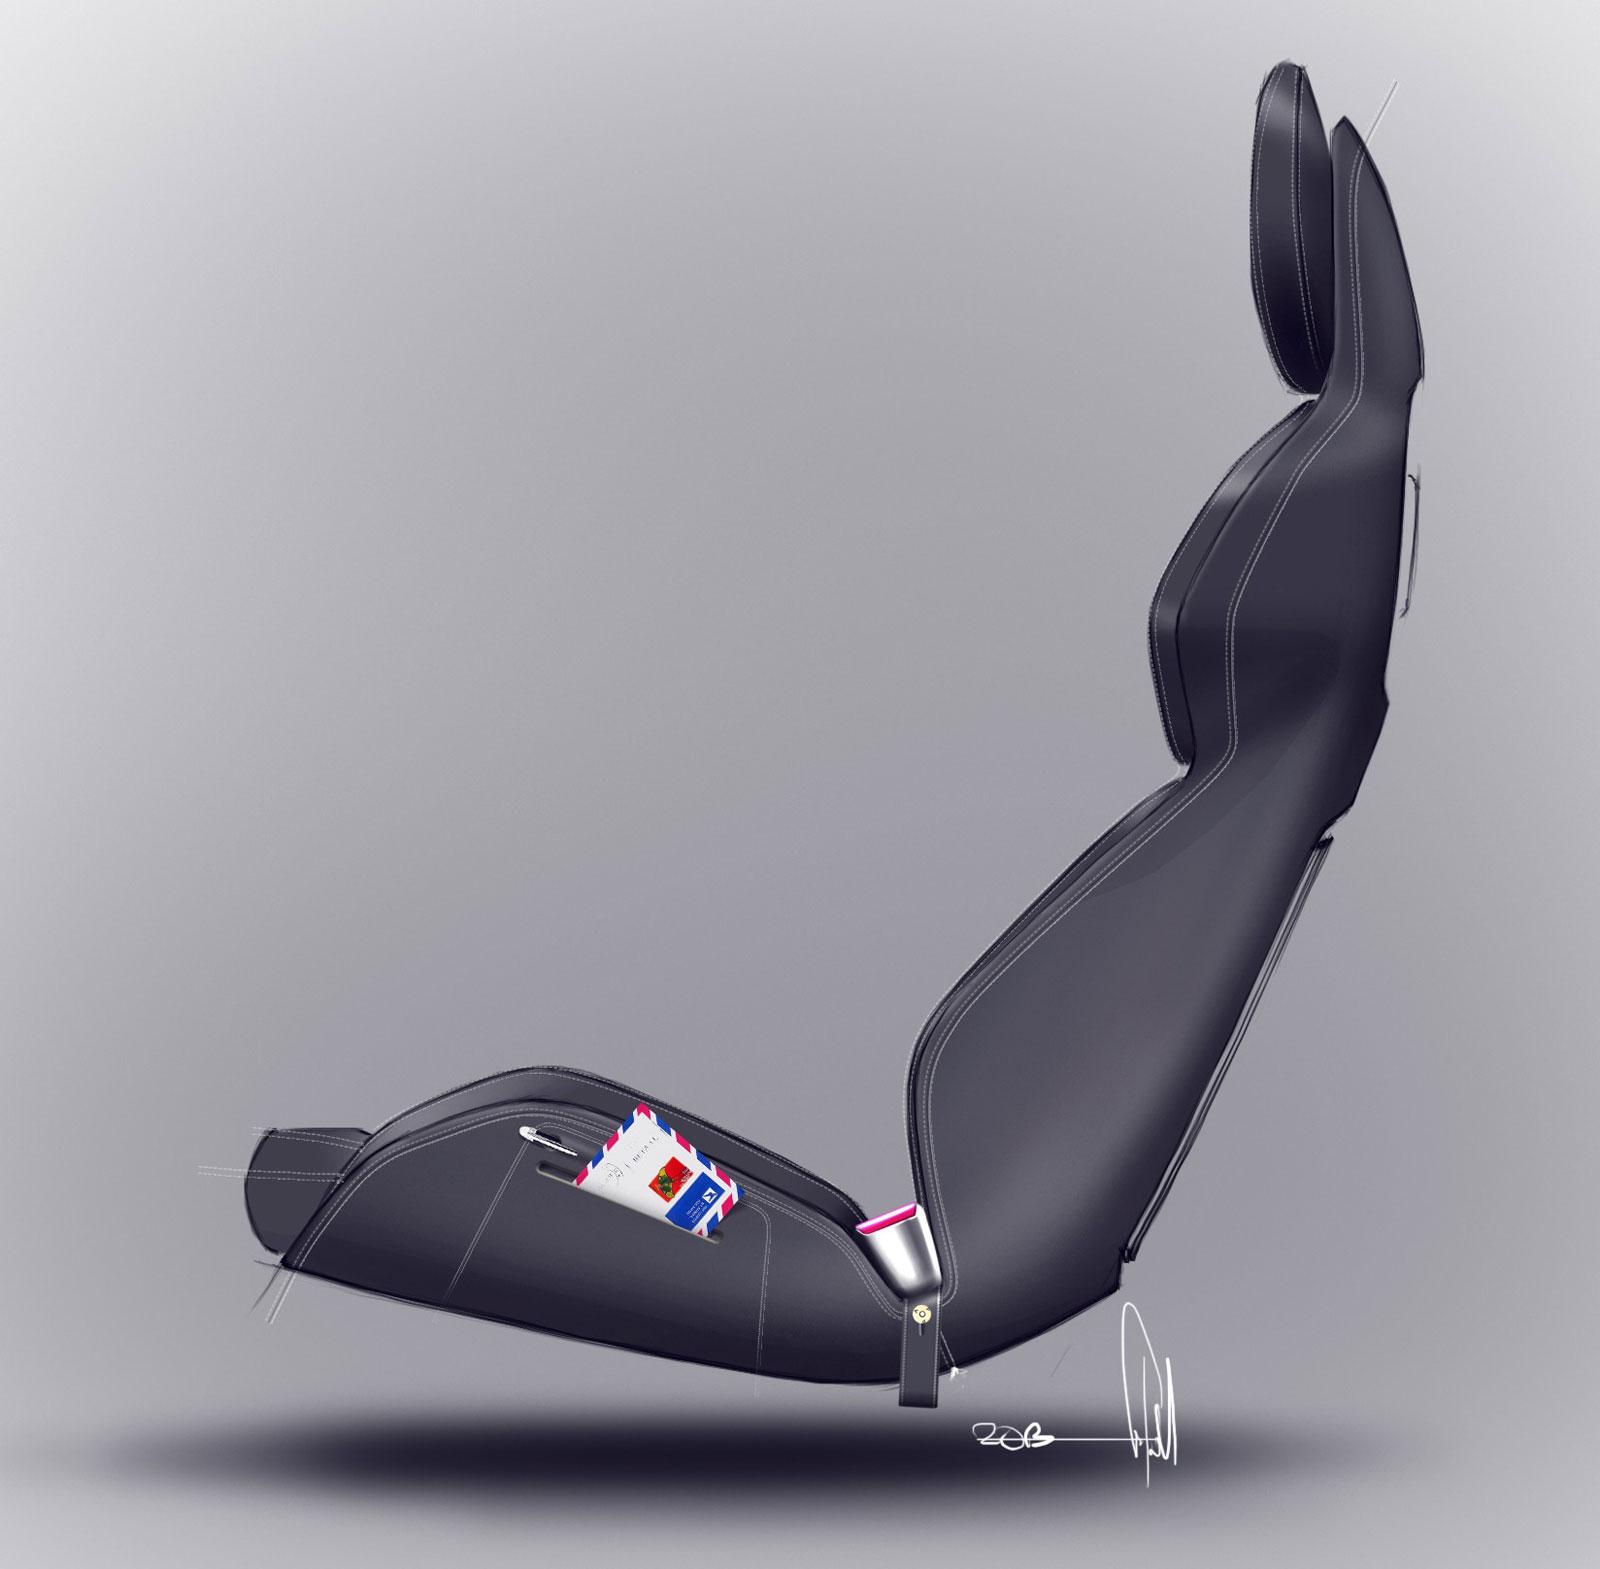 2013 Volvo Concept Coupe Concepts